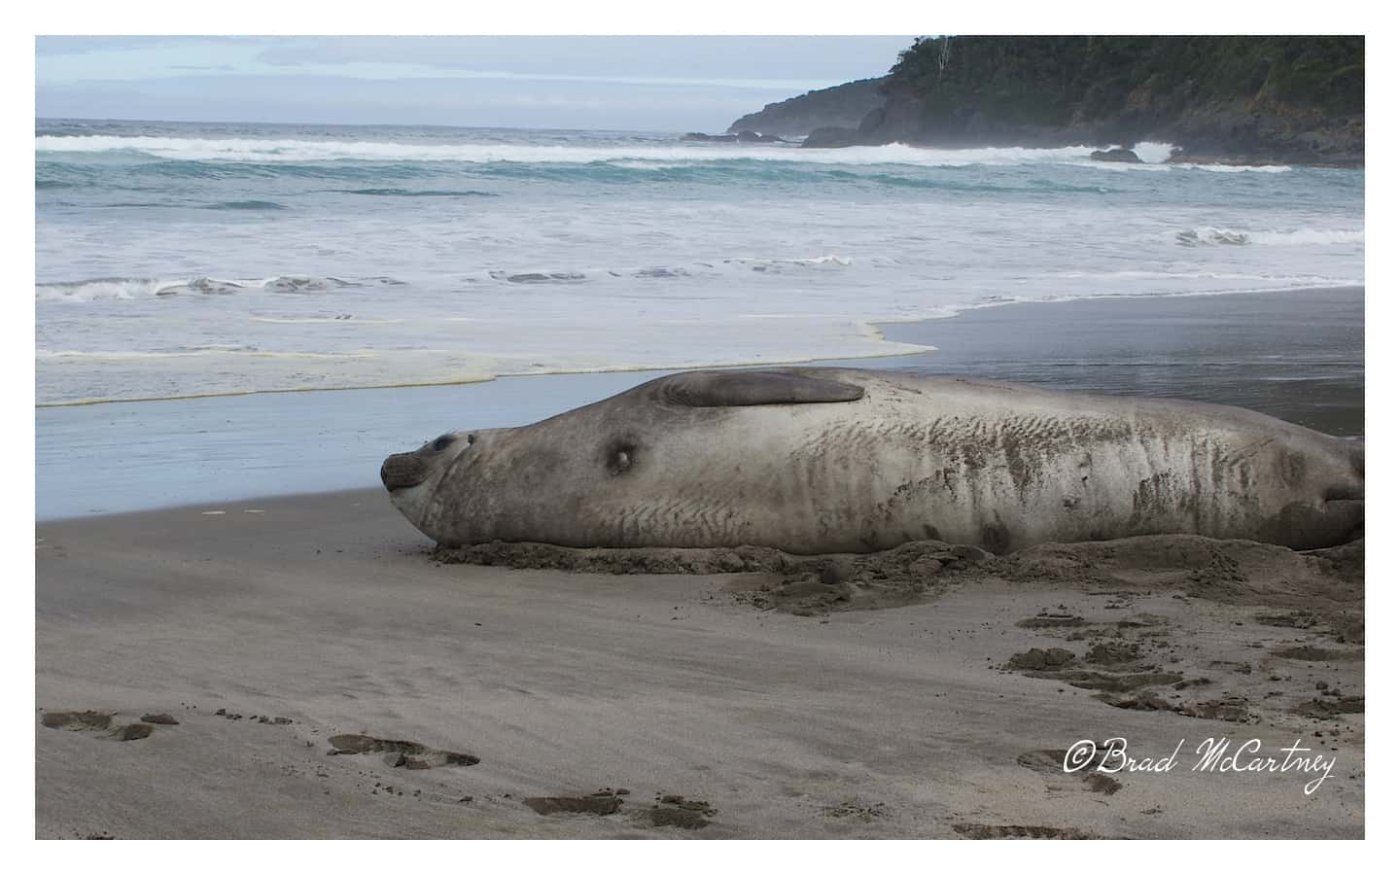 Elephant Seal on the beach in Tasmania Australia